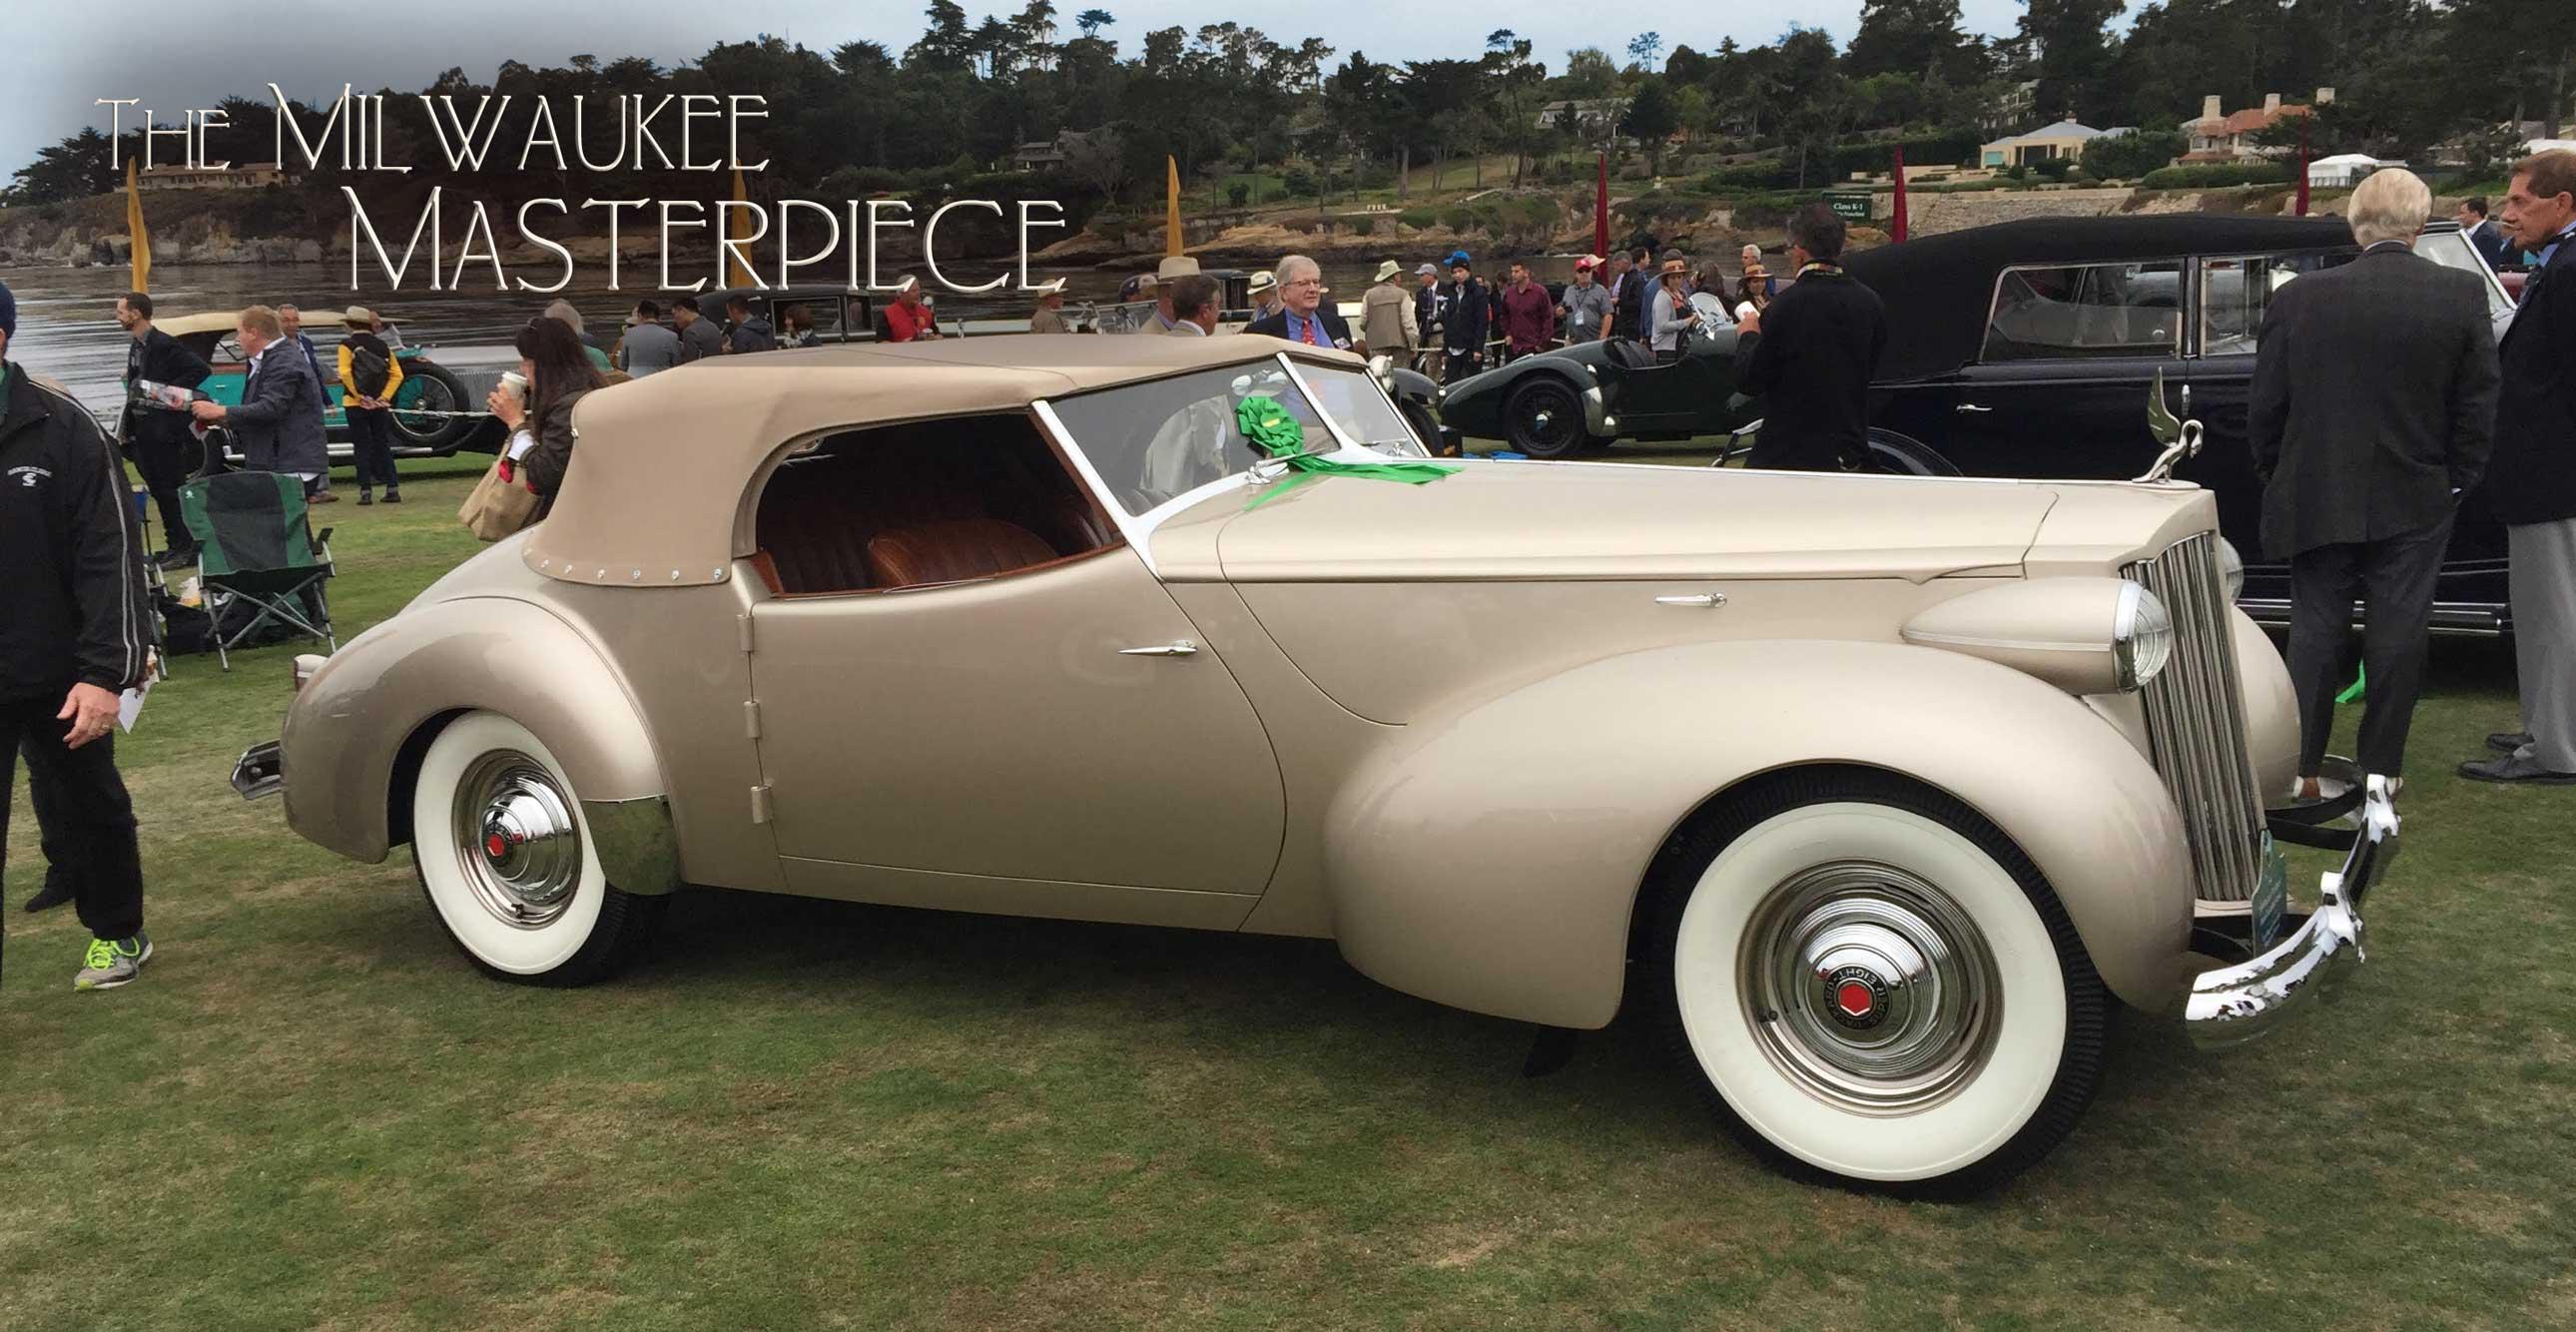 1939 Packard 1703 Super-8 Darrin Convertible Victoria   Pebble Beach Winner   The Milwaukee Masterpiece